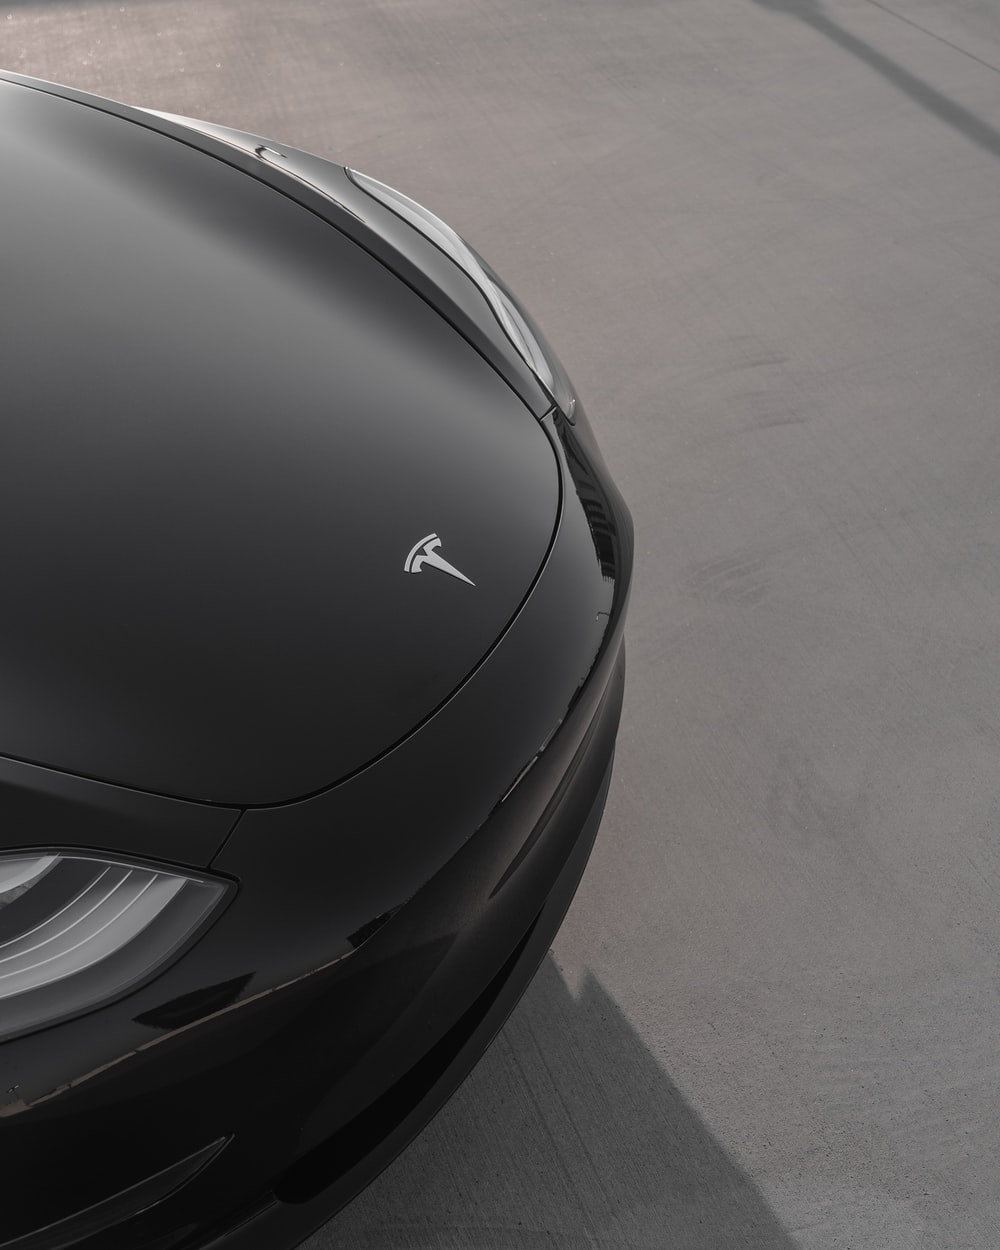 black Tesla vehicle